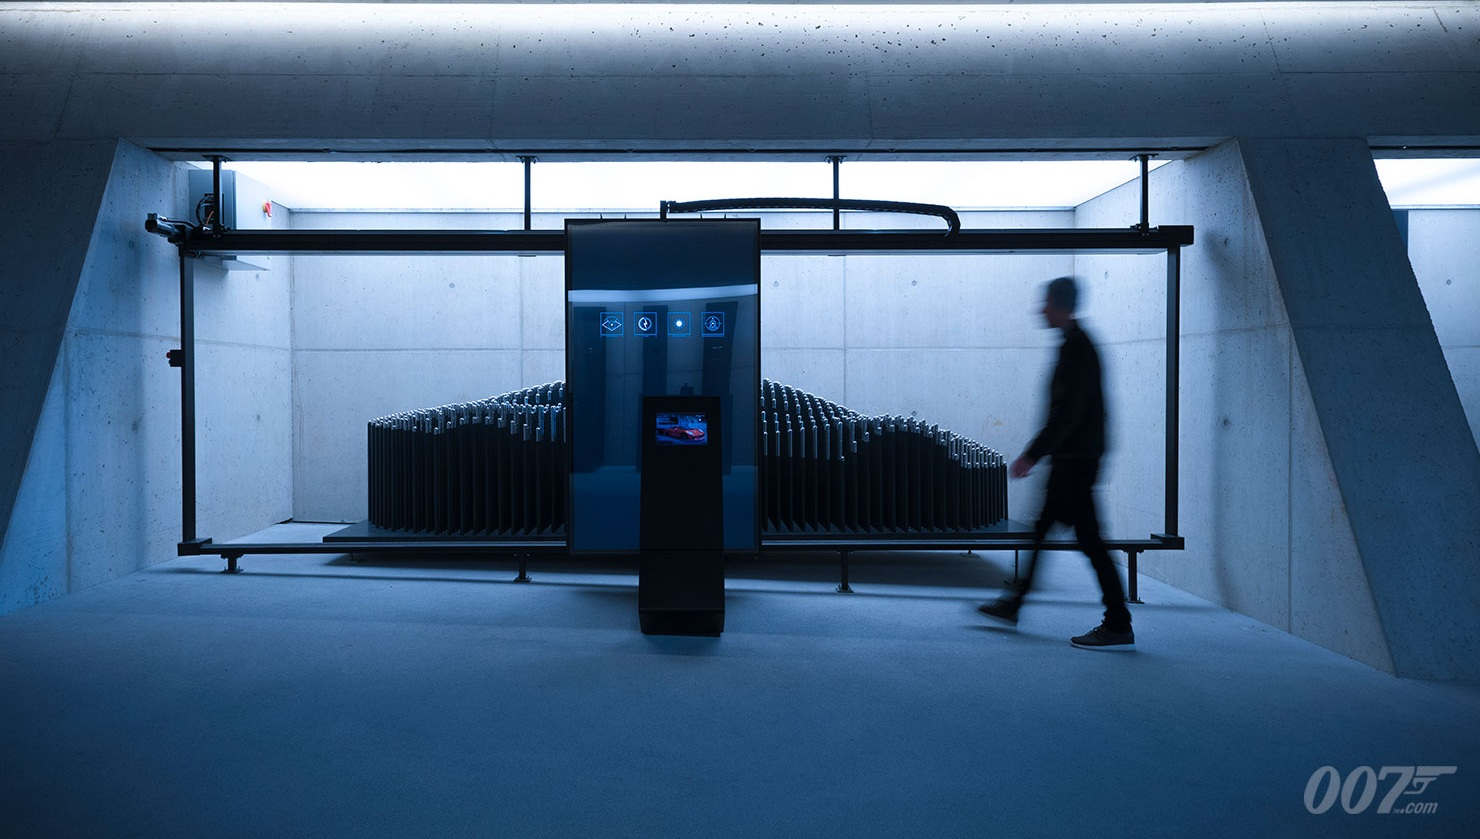 9.-Tech-Lab-007-ELEMENTS-Photo-credit-Kristopher-Grunert_Gallery.jpg